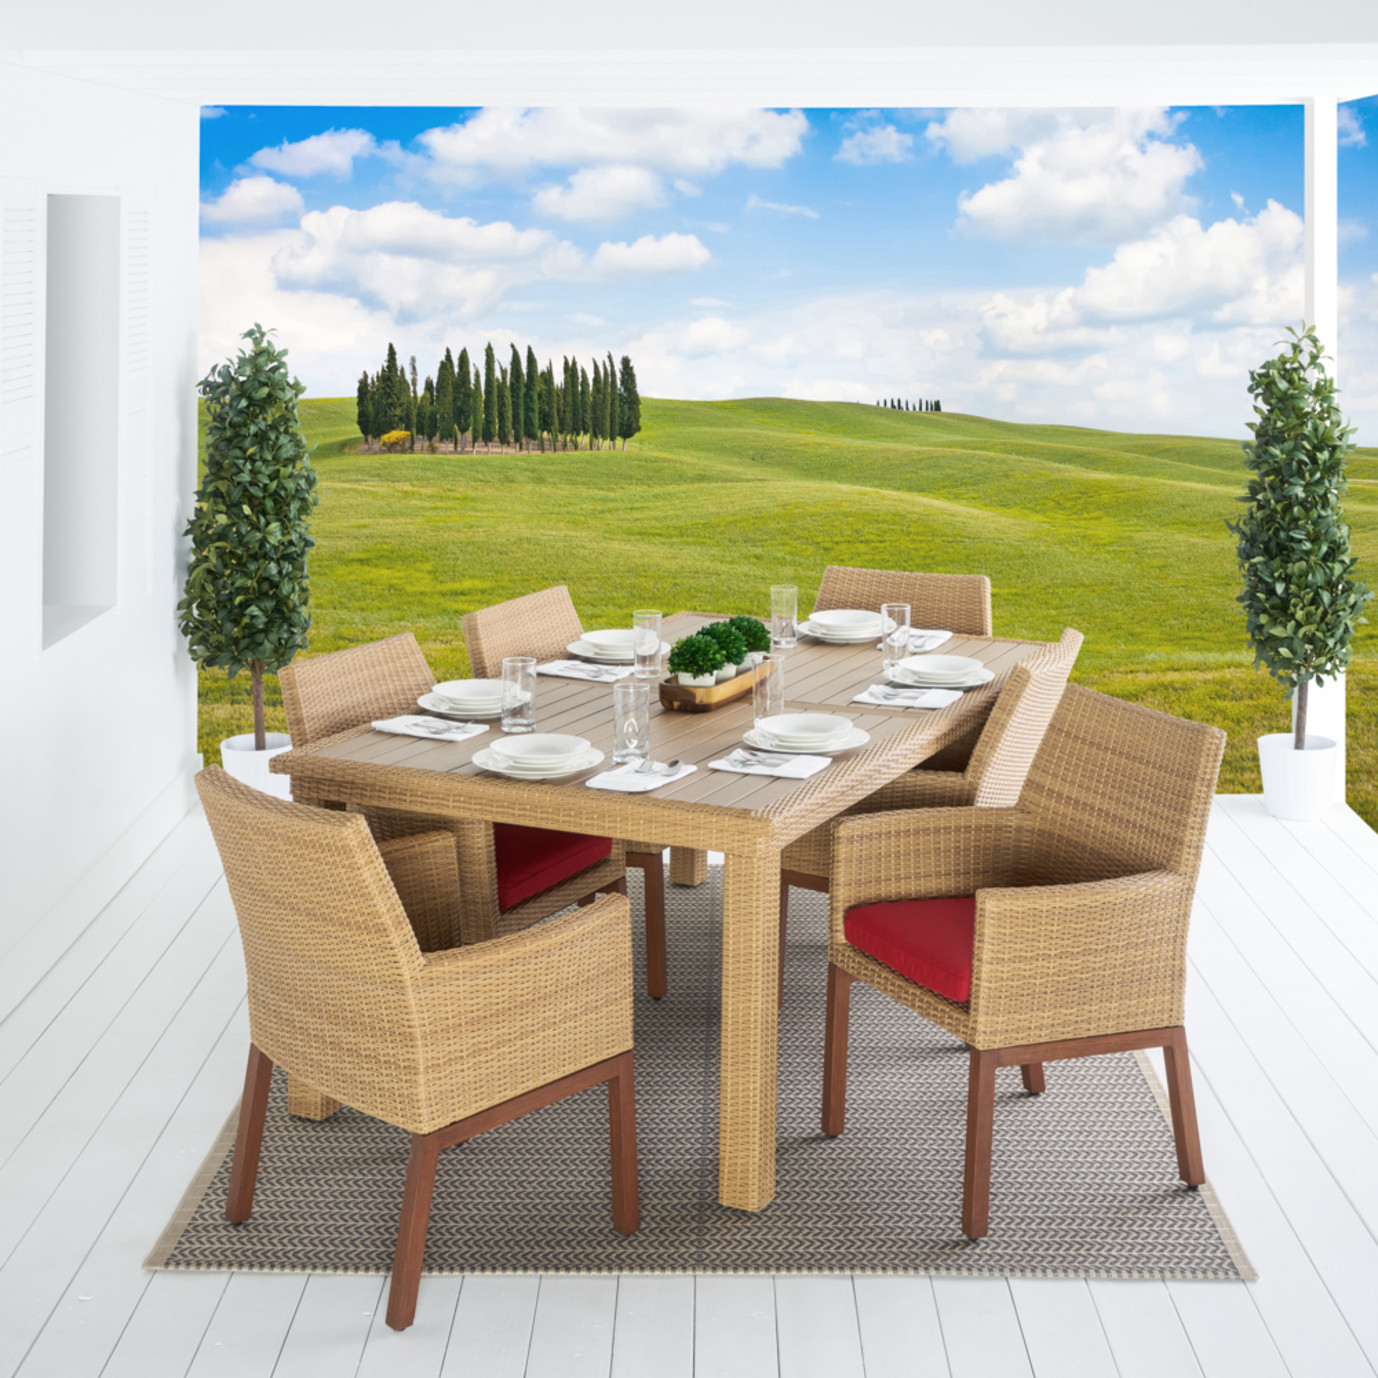 Mili™ 7pc Dining Set - Sunset Red